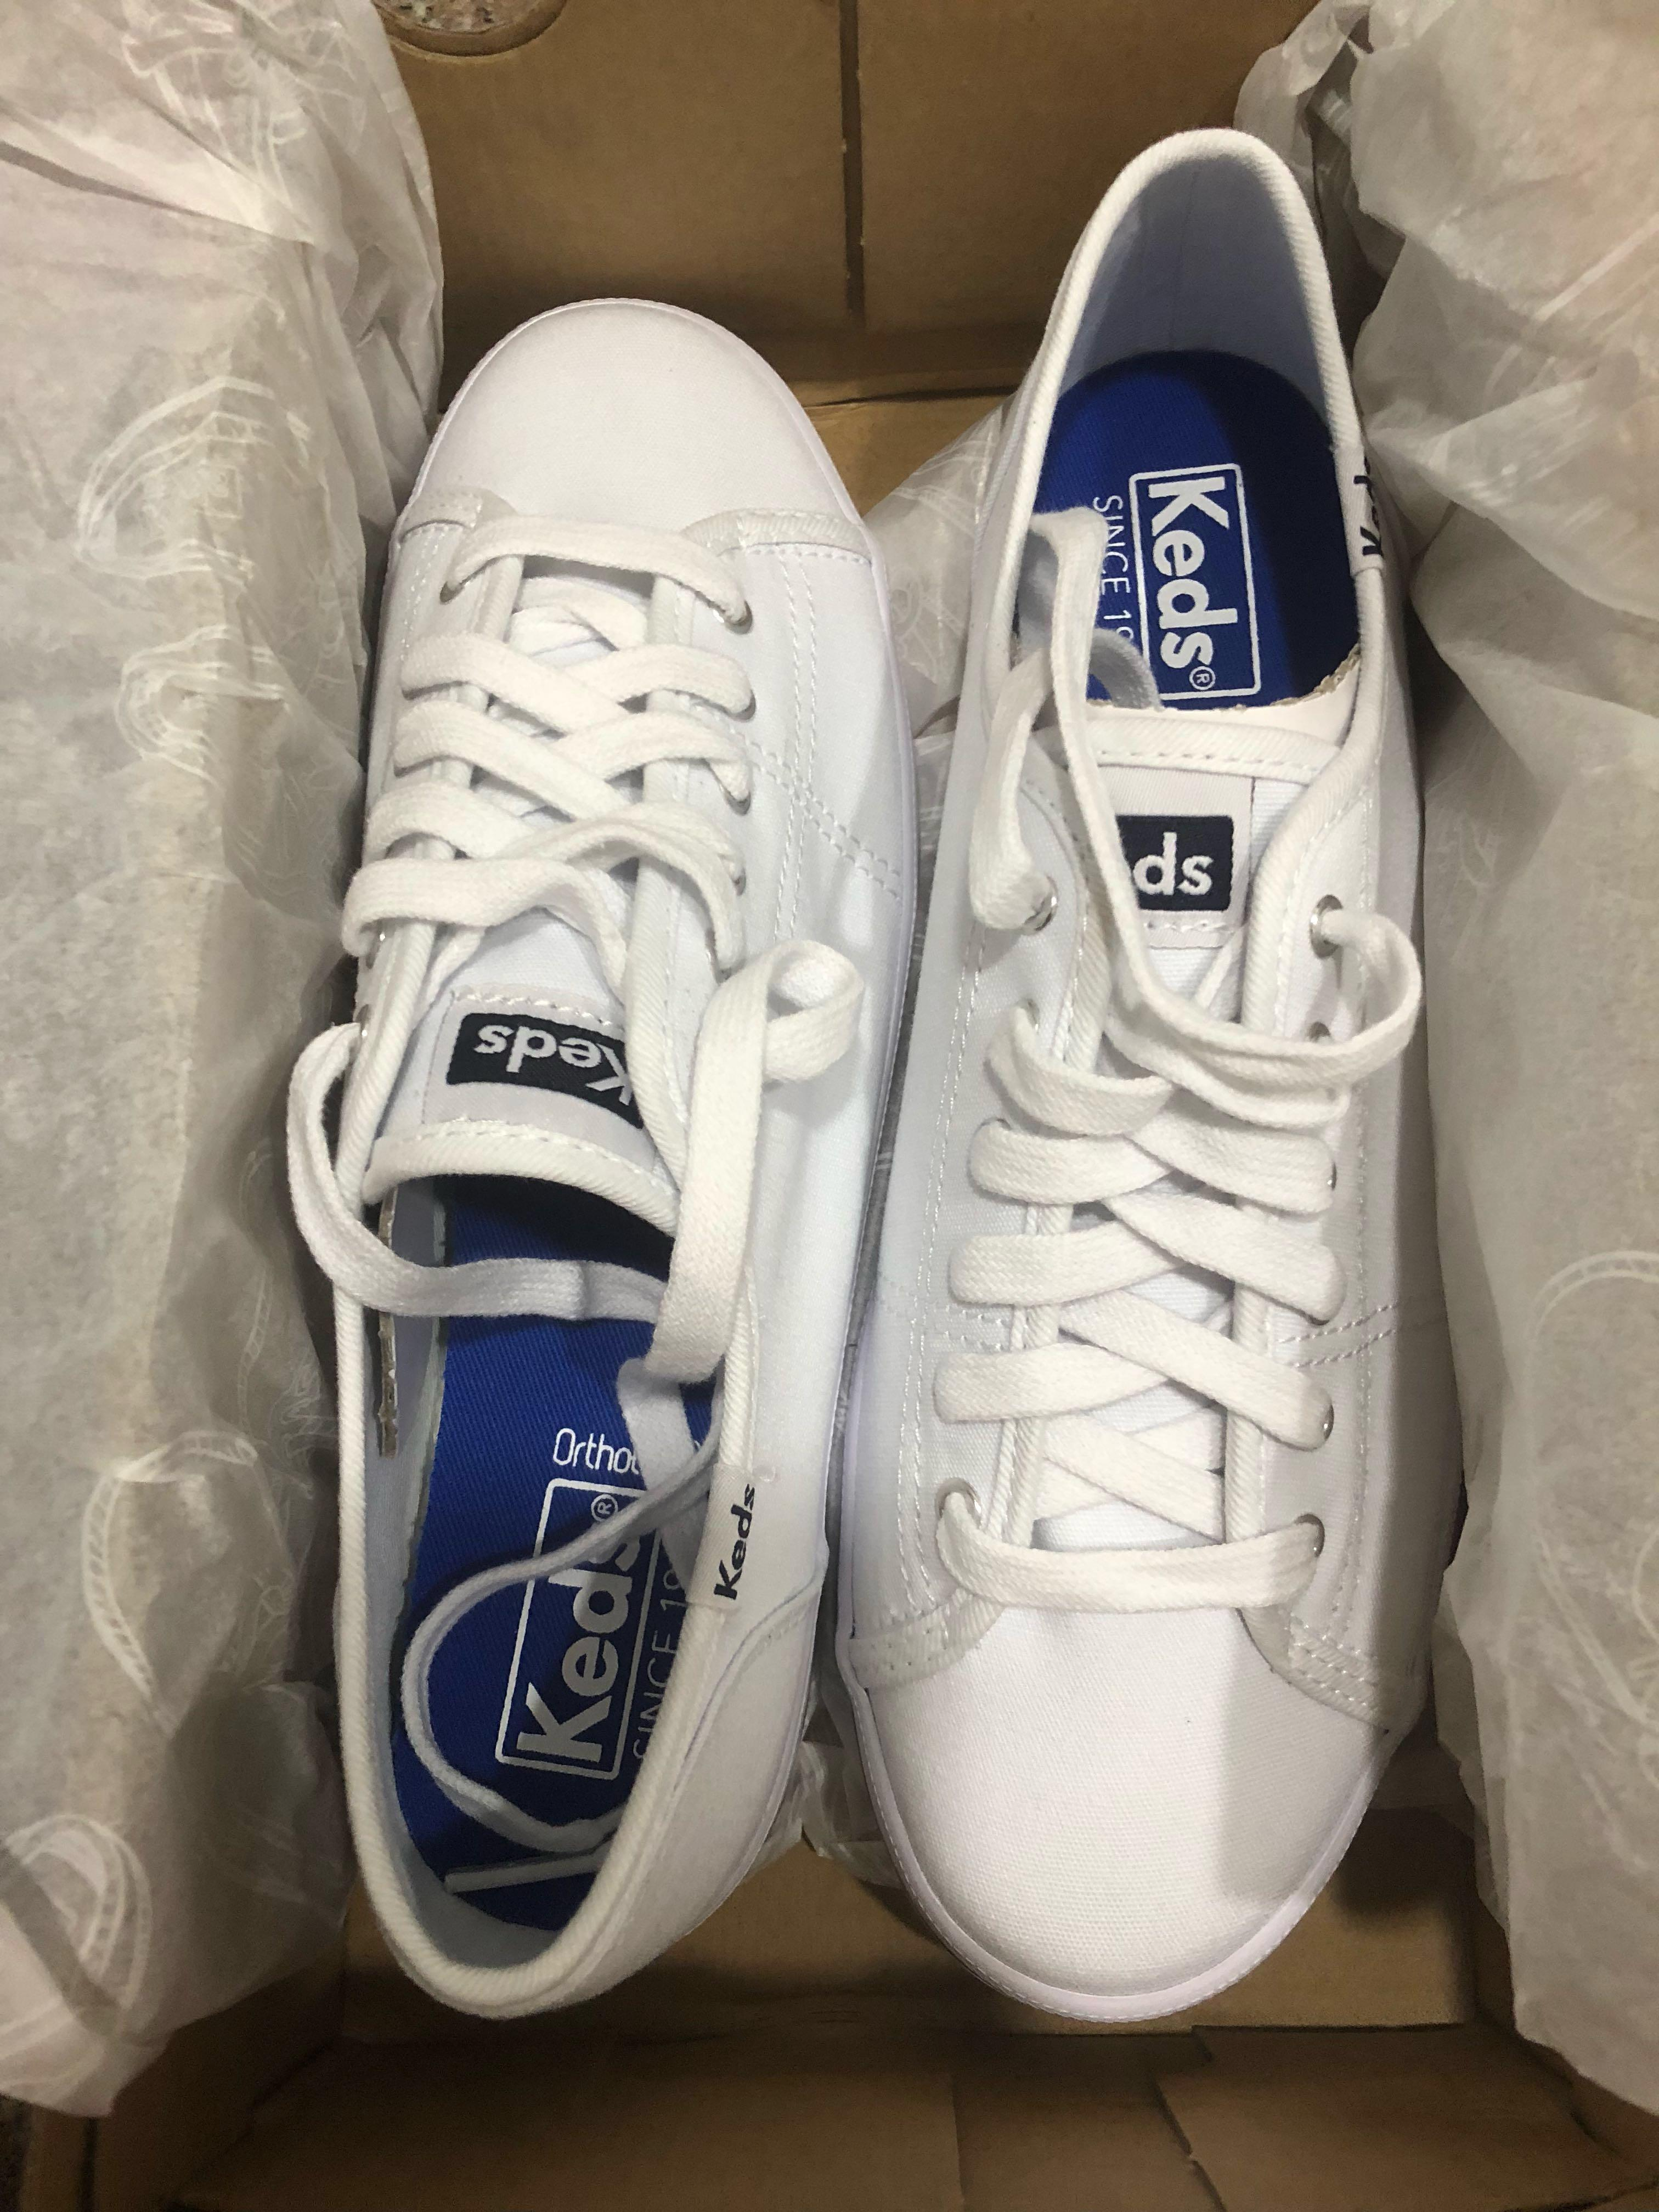 Keds kickstart white sneakers, Women's